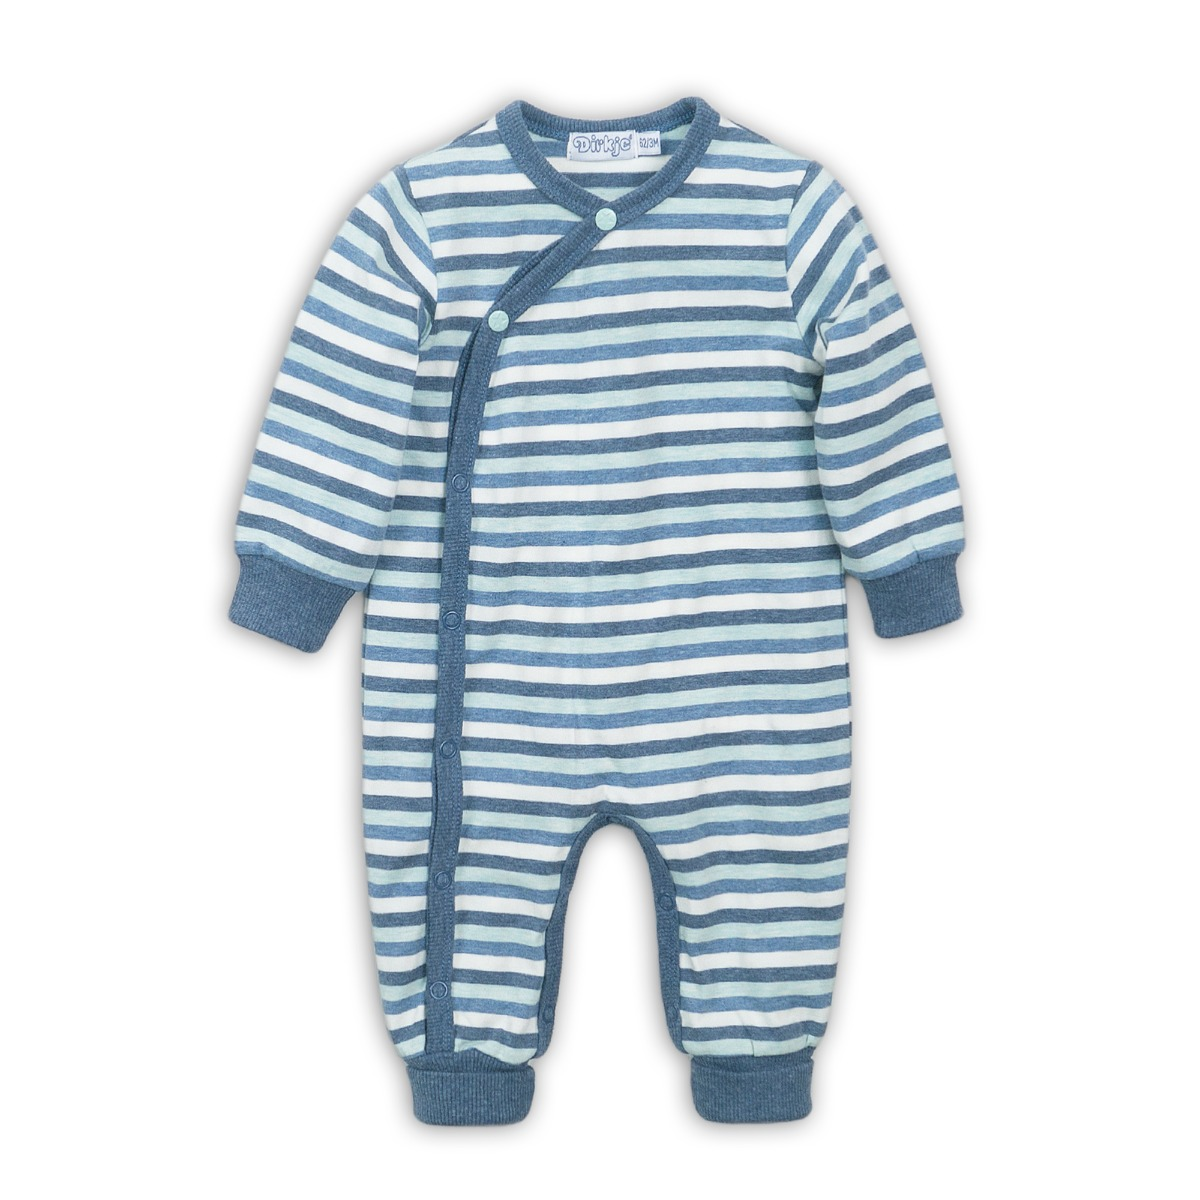 Salopeta bebe cu dungi orizontale Dirkje imagine